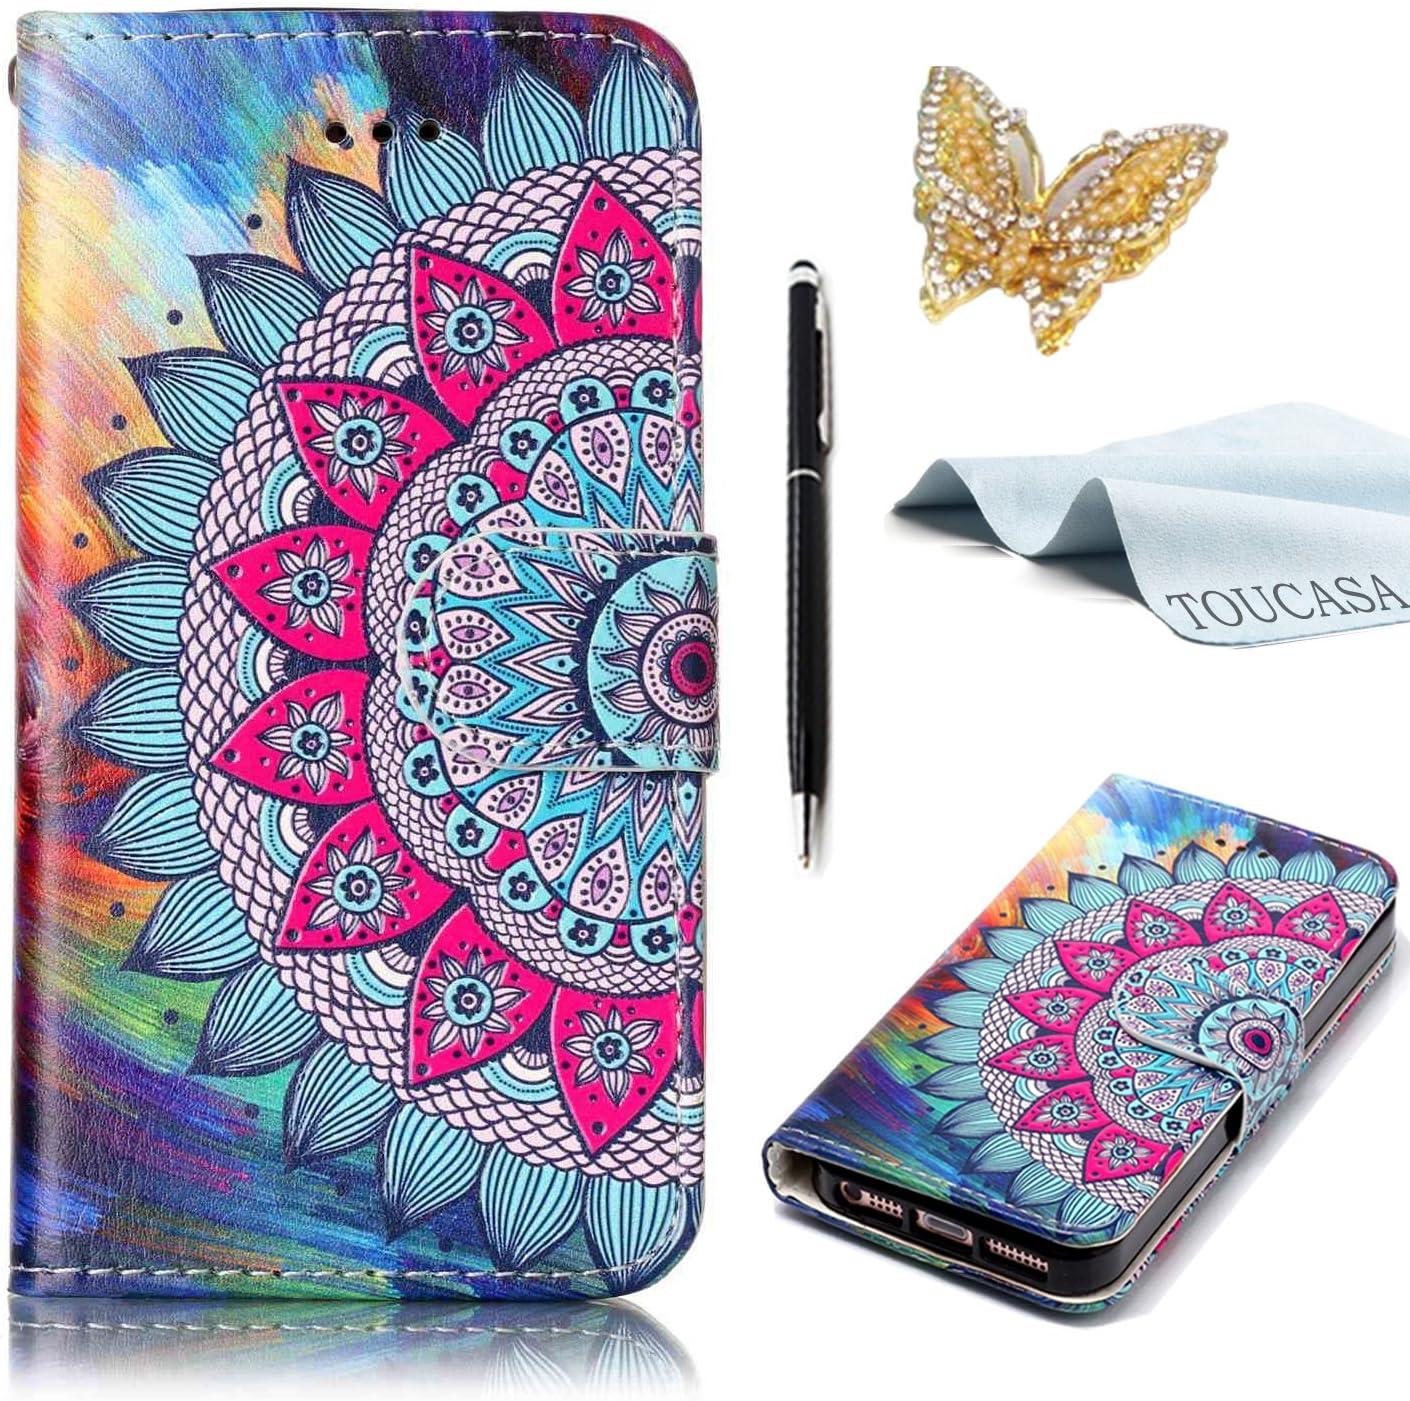 TOUCASA Funda Galaxy J3 2015,Funda J3 2016, PU Cuero Suave Diseño de Lindo Animal Mariposa Flor Mandala Exquisita Pintura al óleo en Relieve Funda para Samsung J3 2015/J3 2016-Flor de Mandala